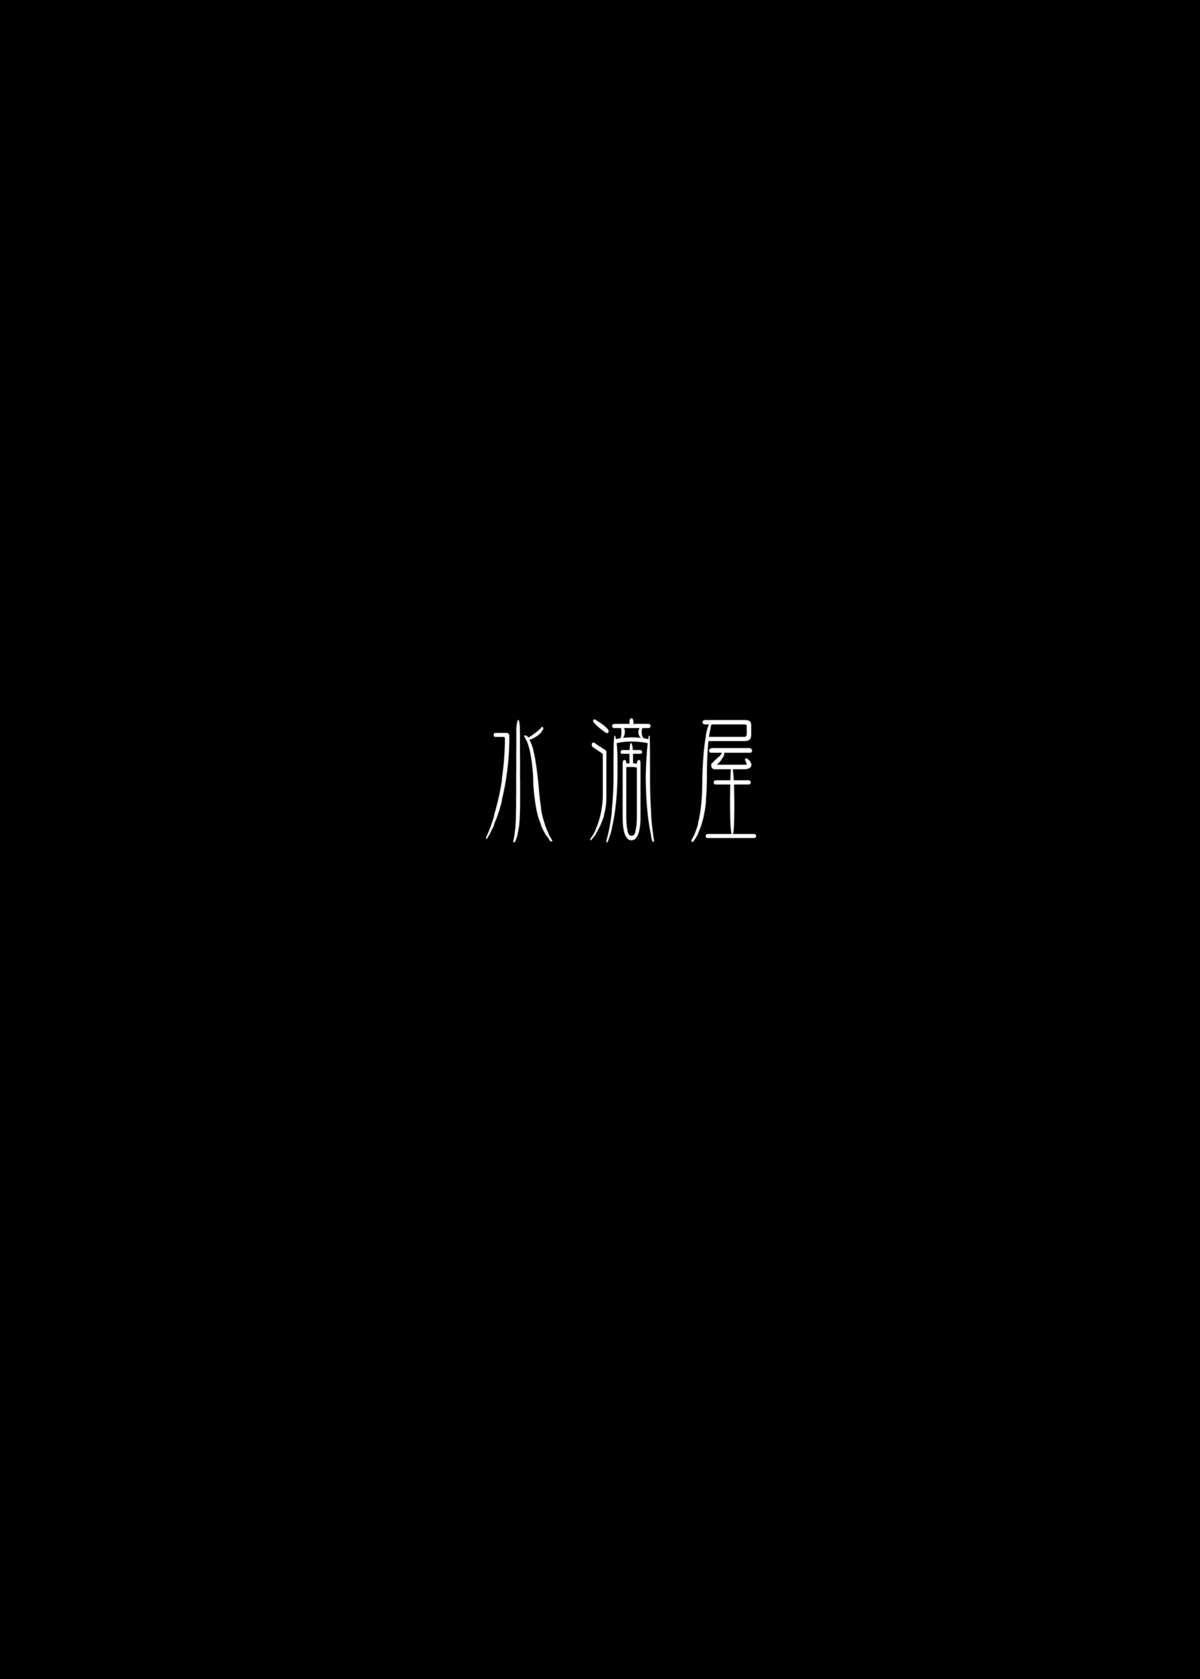 [Suitekiya (Suiteki-ka Yū-min)]Kennai Mating Scandal (1: Einclad / 2: Fairy Dance) SAO The Complete (Sword Art Online) 30